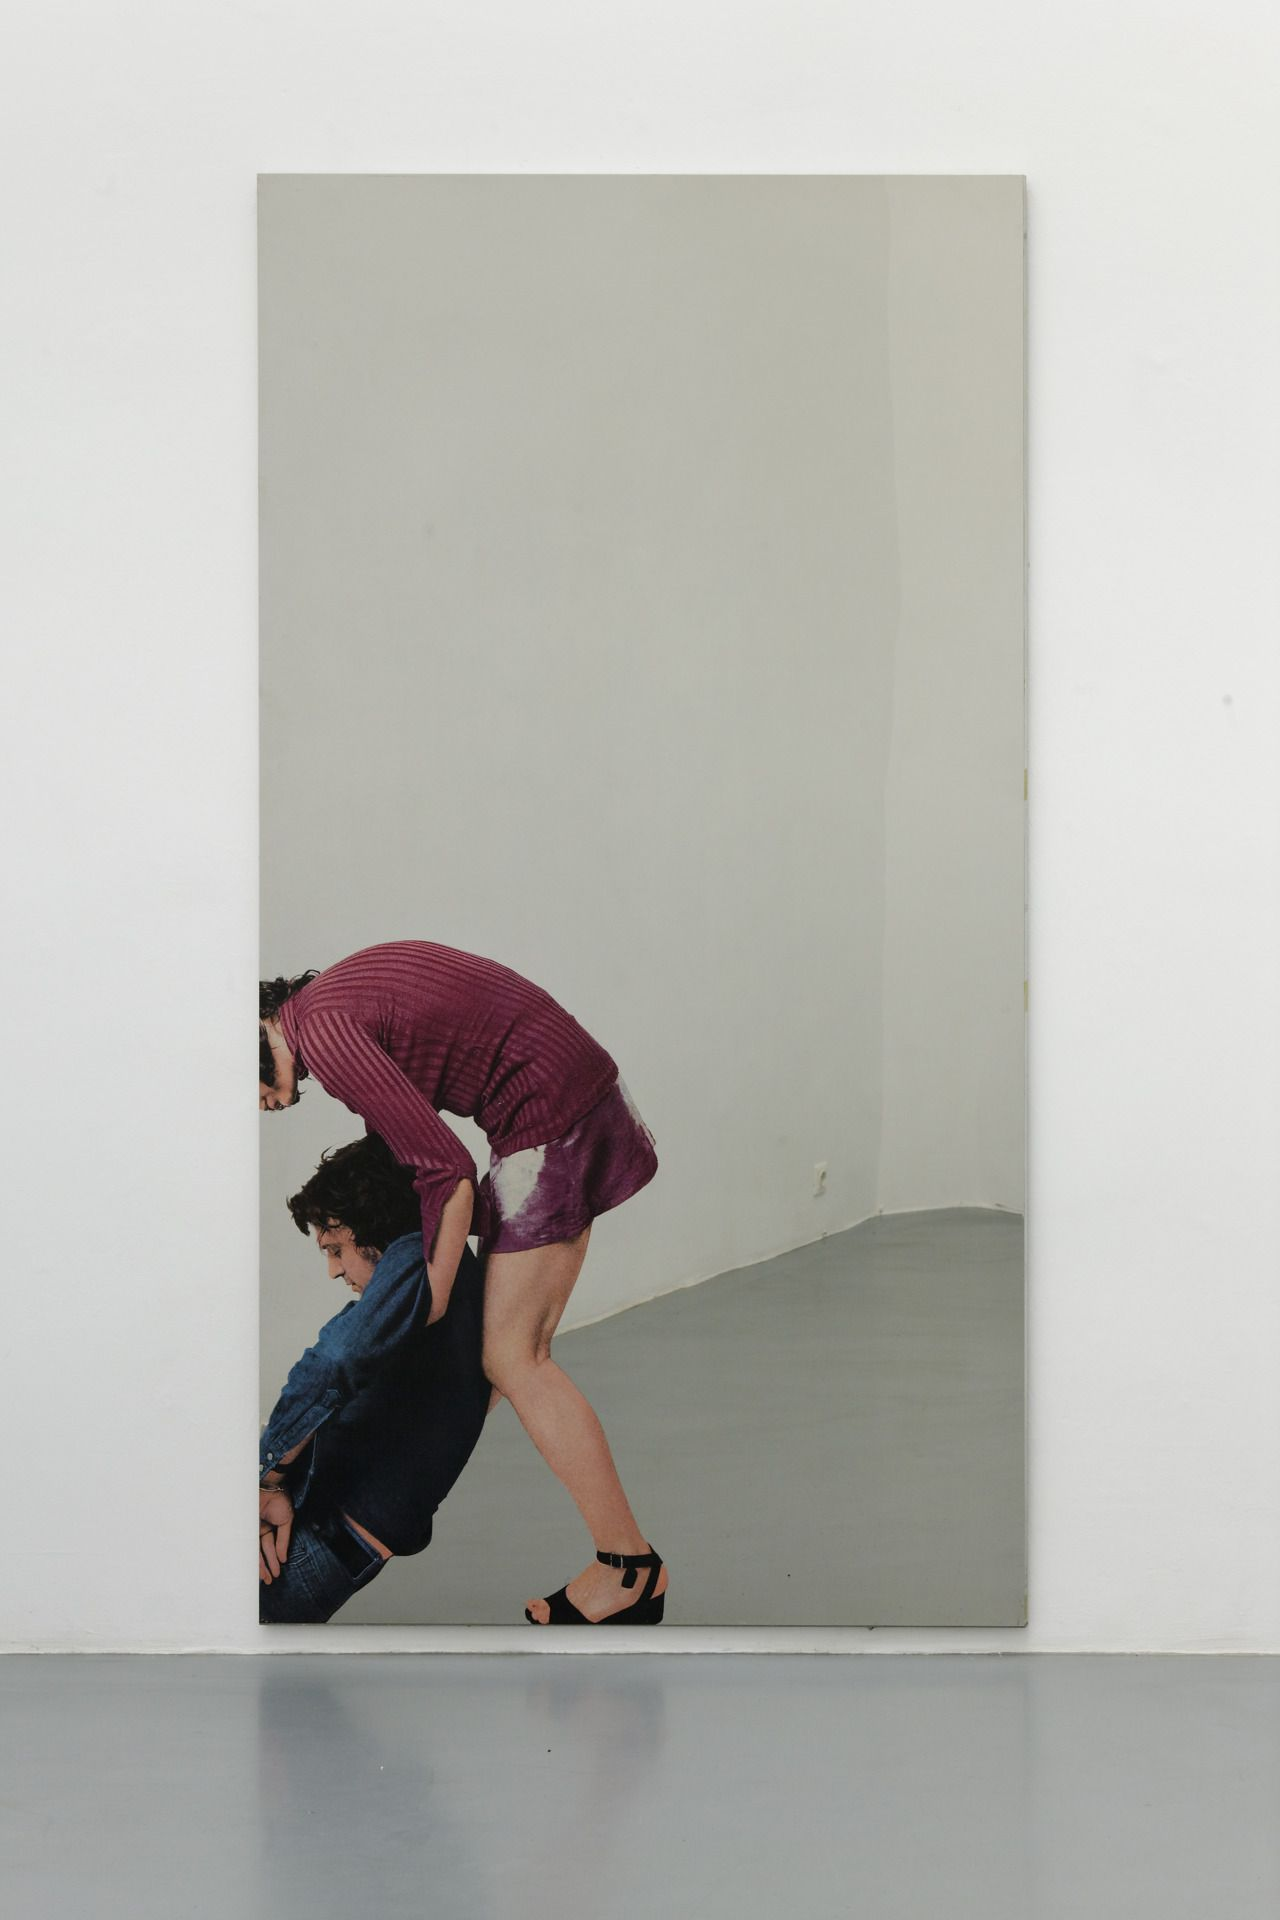 tra-noi: Michelangelo Pistoletto. Deposizione (silkscreen on polished stainless steel; 230 x 125 cm). 1962 - 1973.